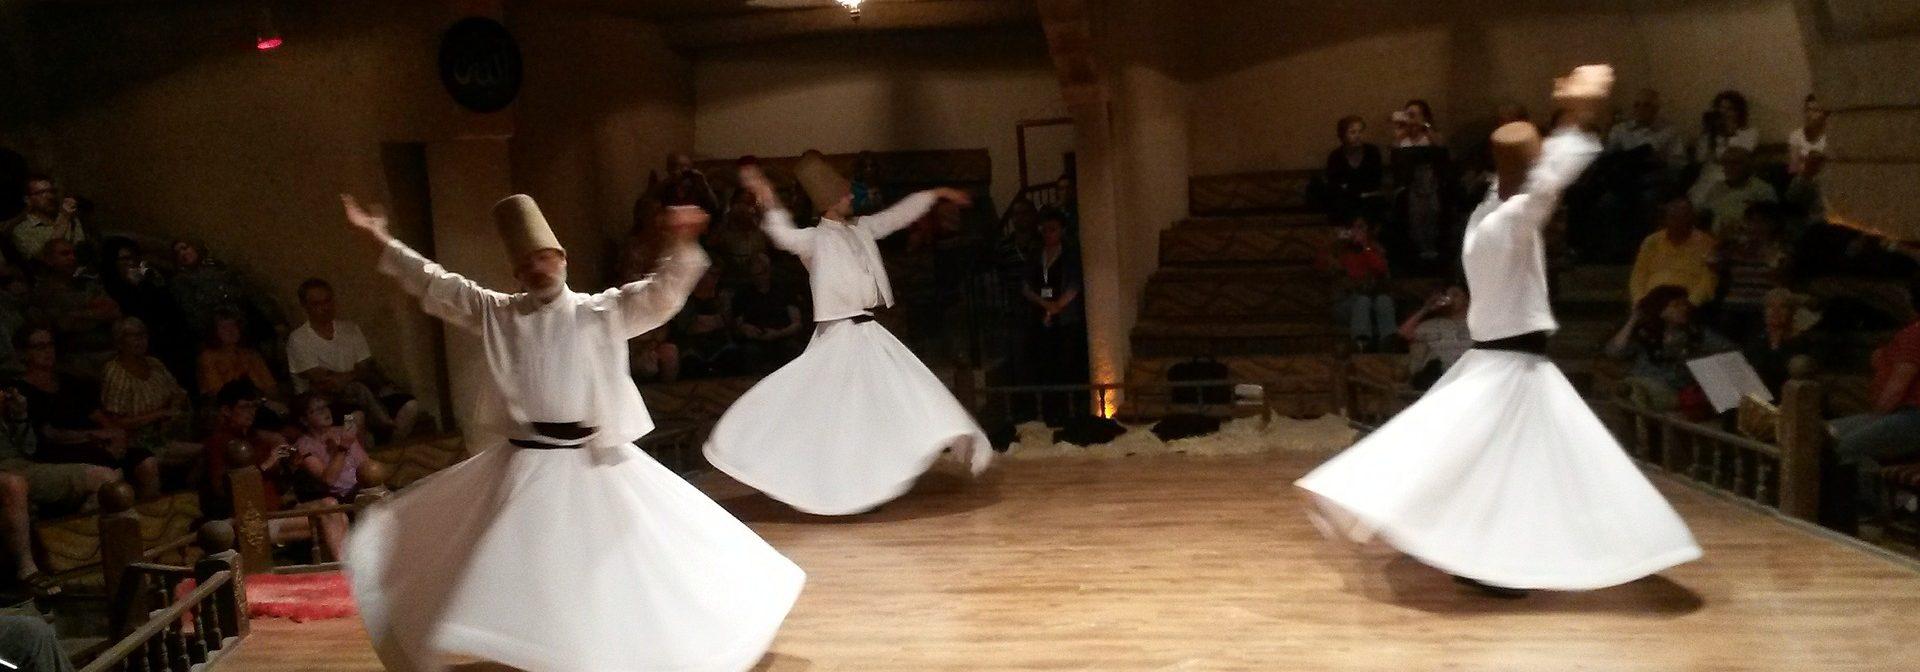 Recensie 'Derwisj ben ik, dansende derwisj'